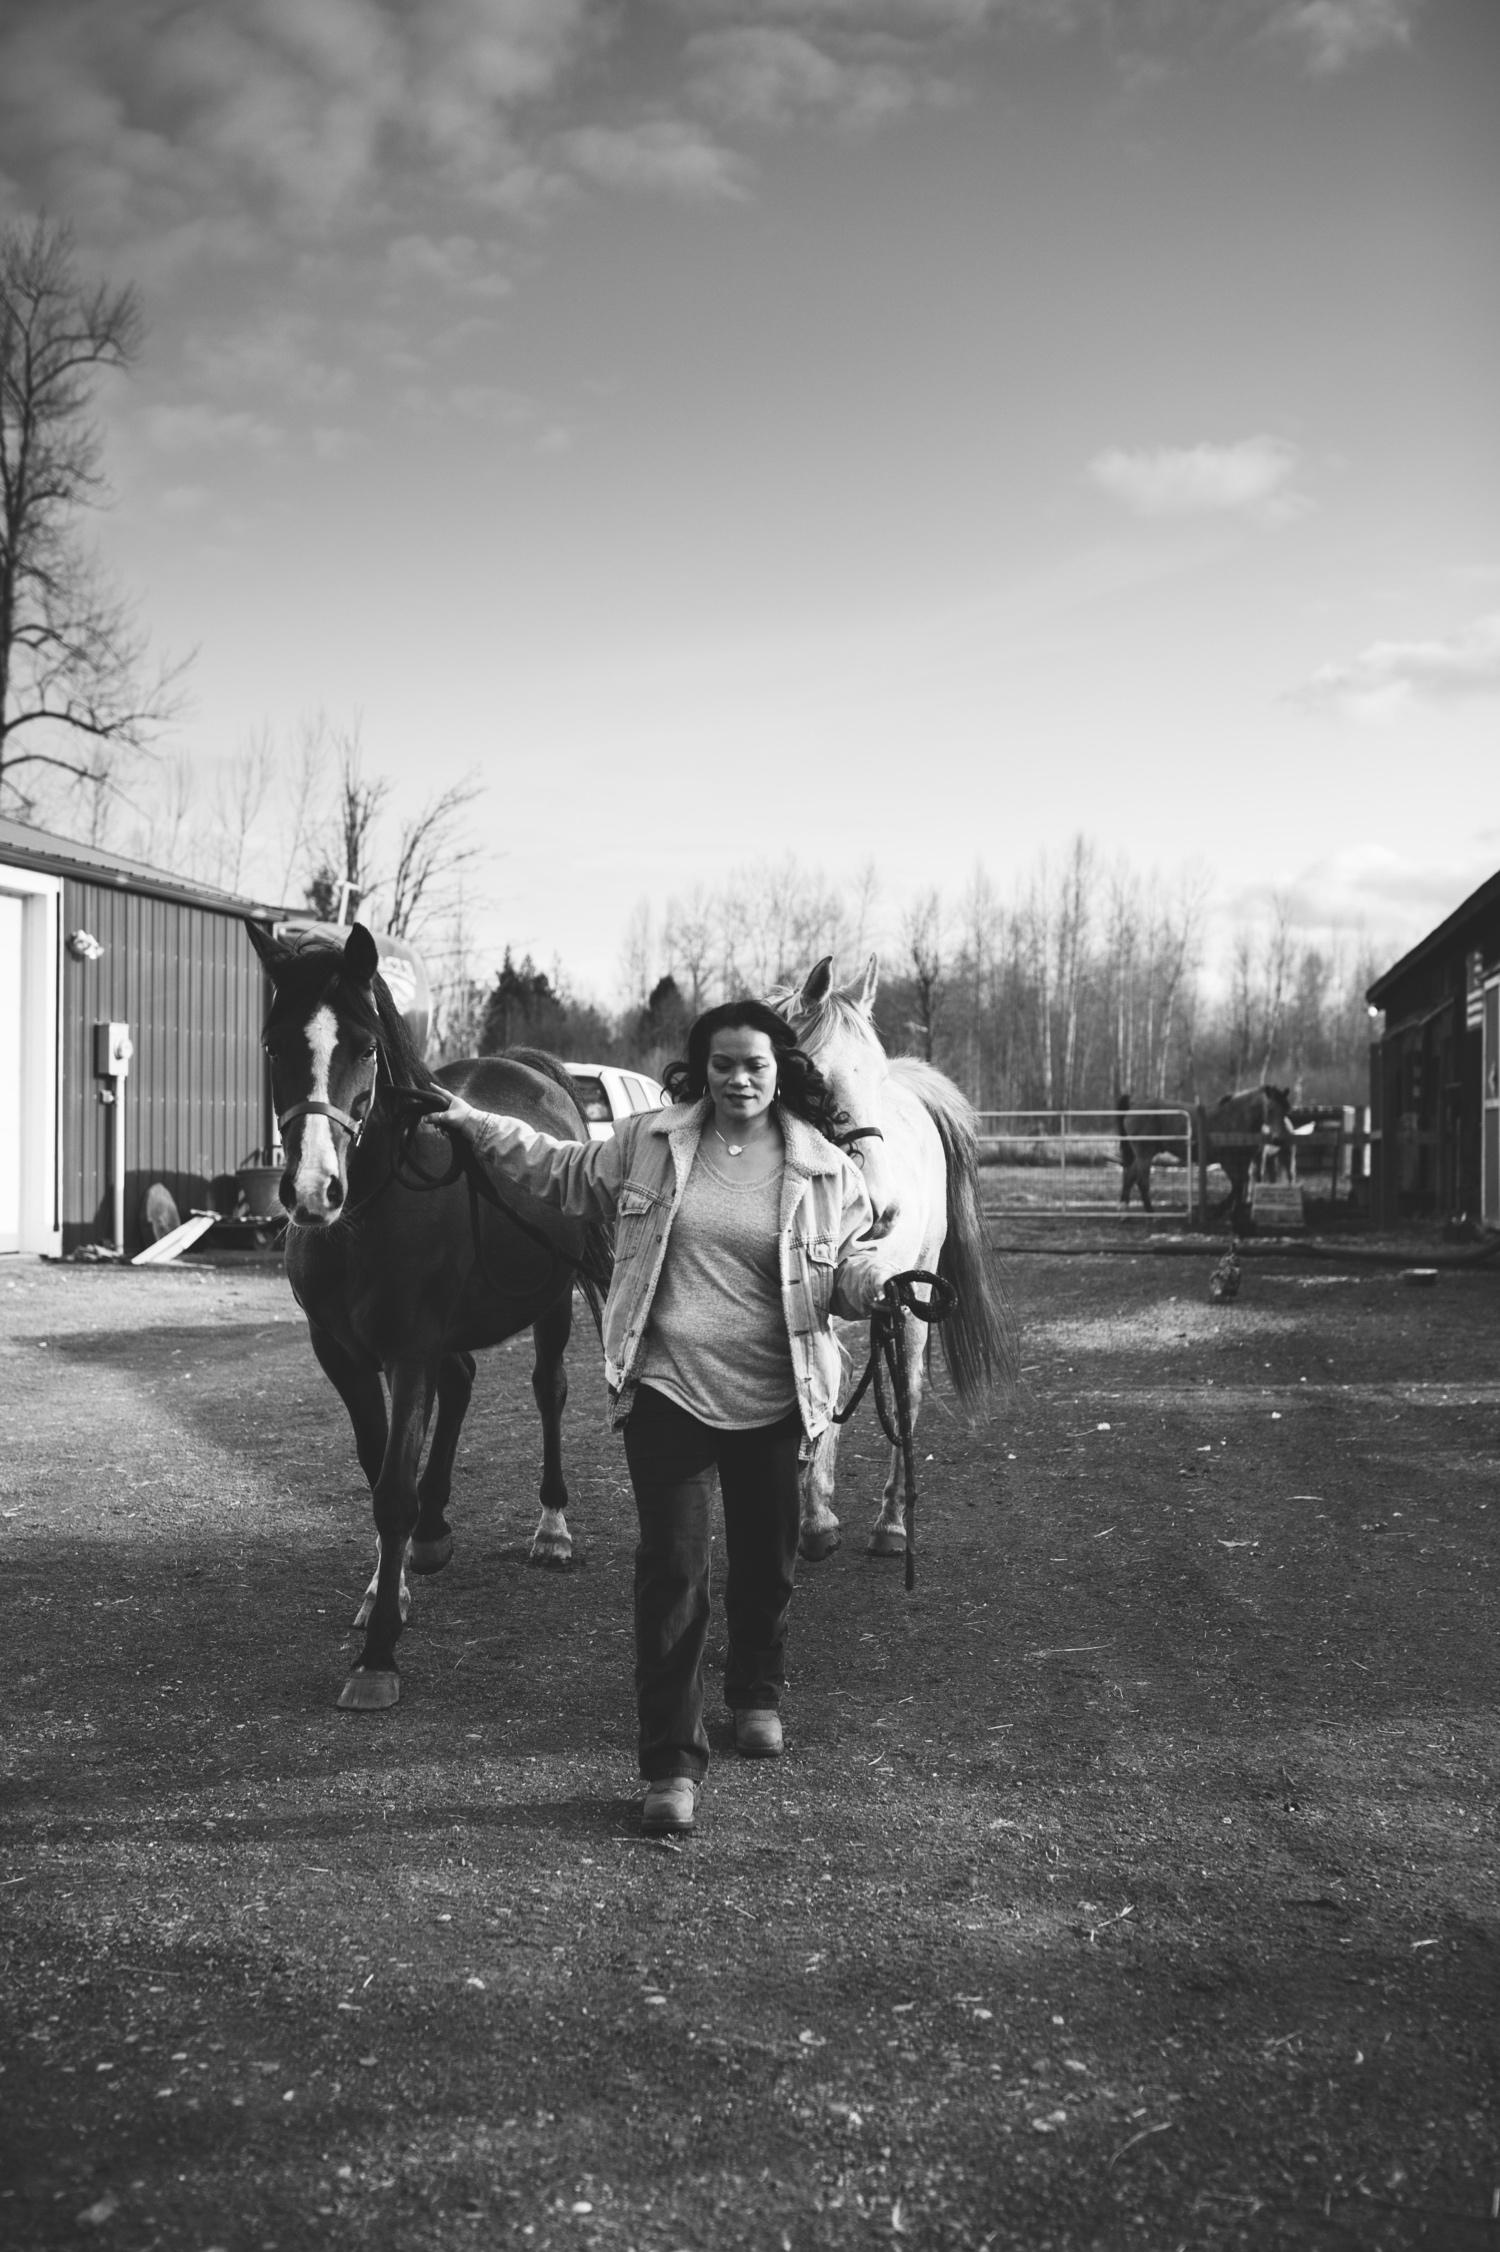 09_WD-29_lesbianwedding_farm_intimatewedding_lifestyle_goats_zoeburchardstudio_lgbtq_anniversary_lesbian_elopementphotographer_zoeburchard_farmsession_chickens_inhomesession_field_horses_farmfresh.jpg